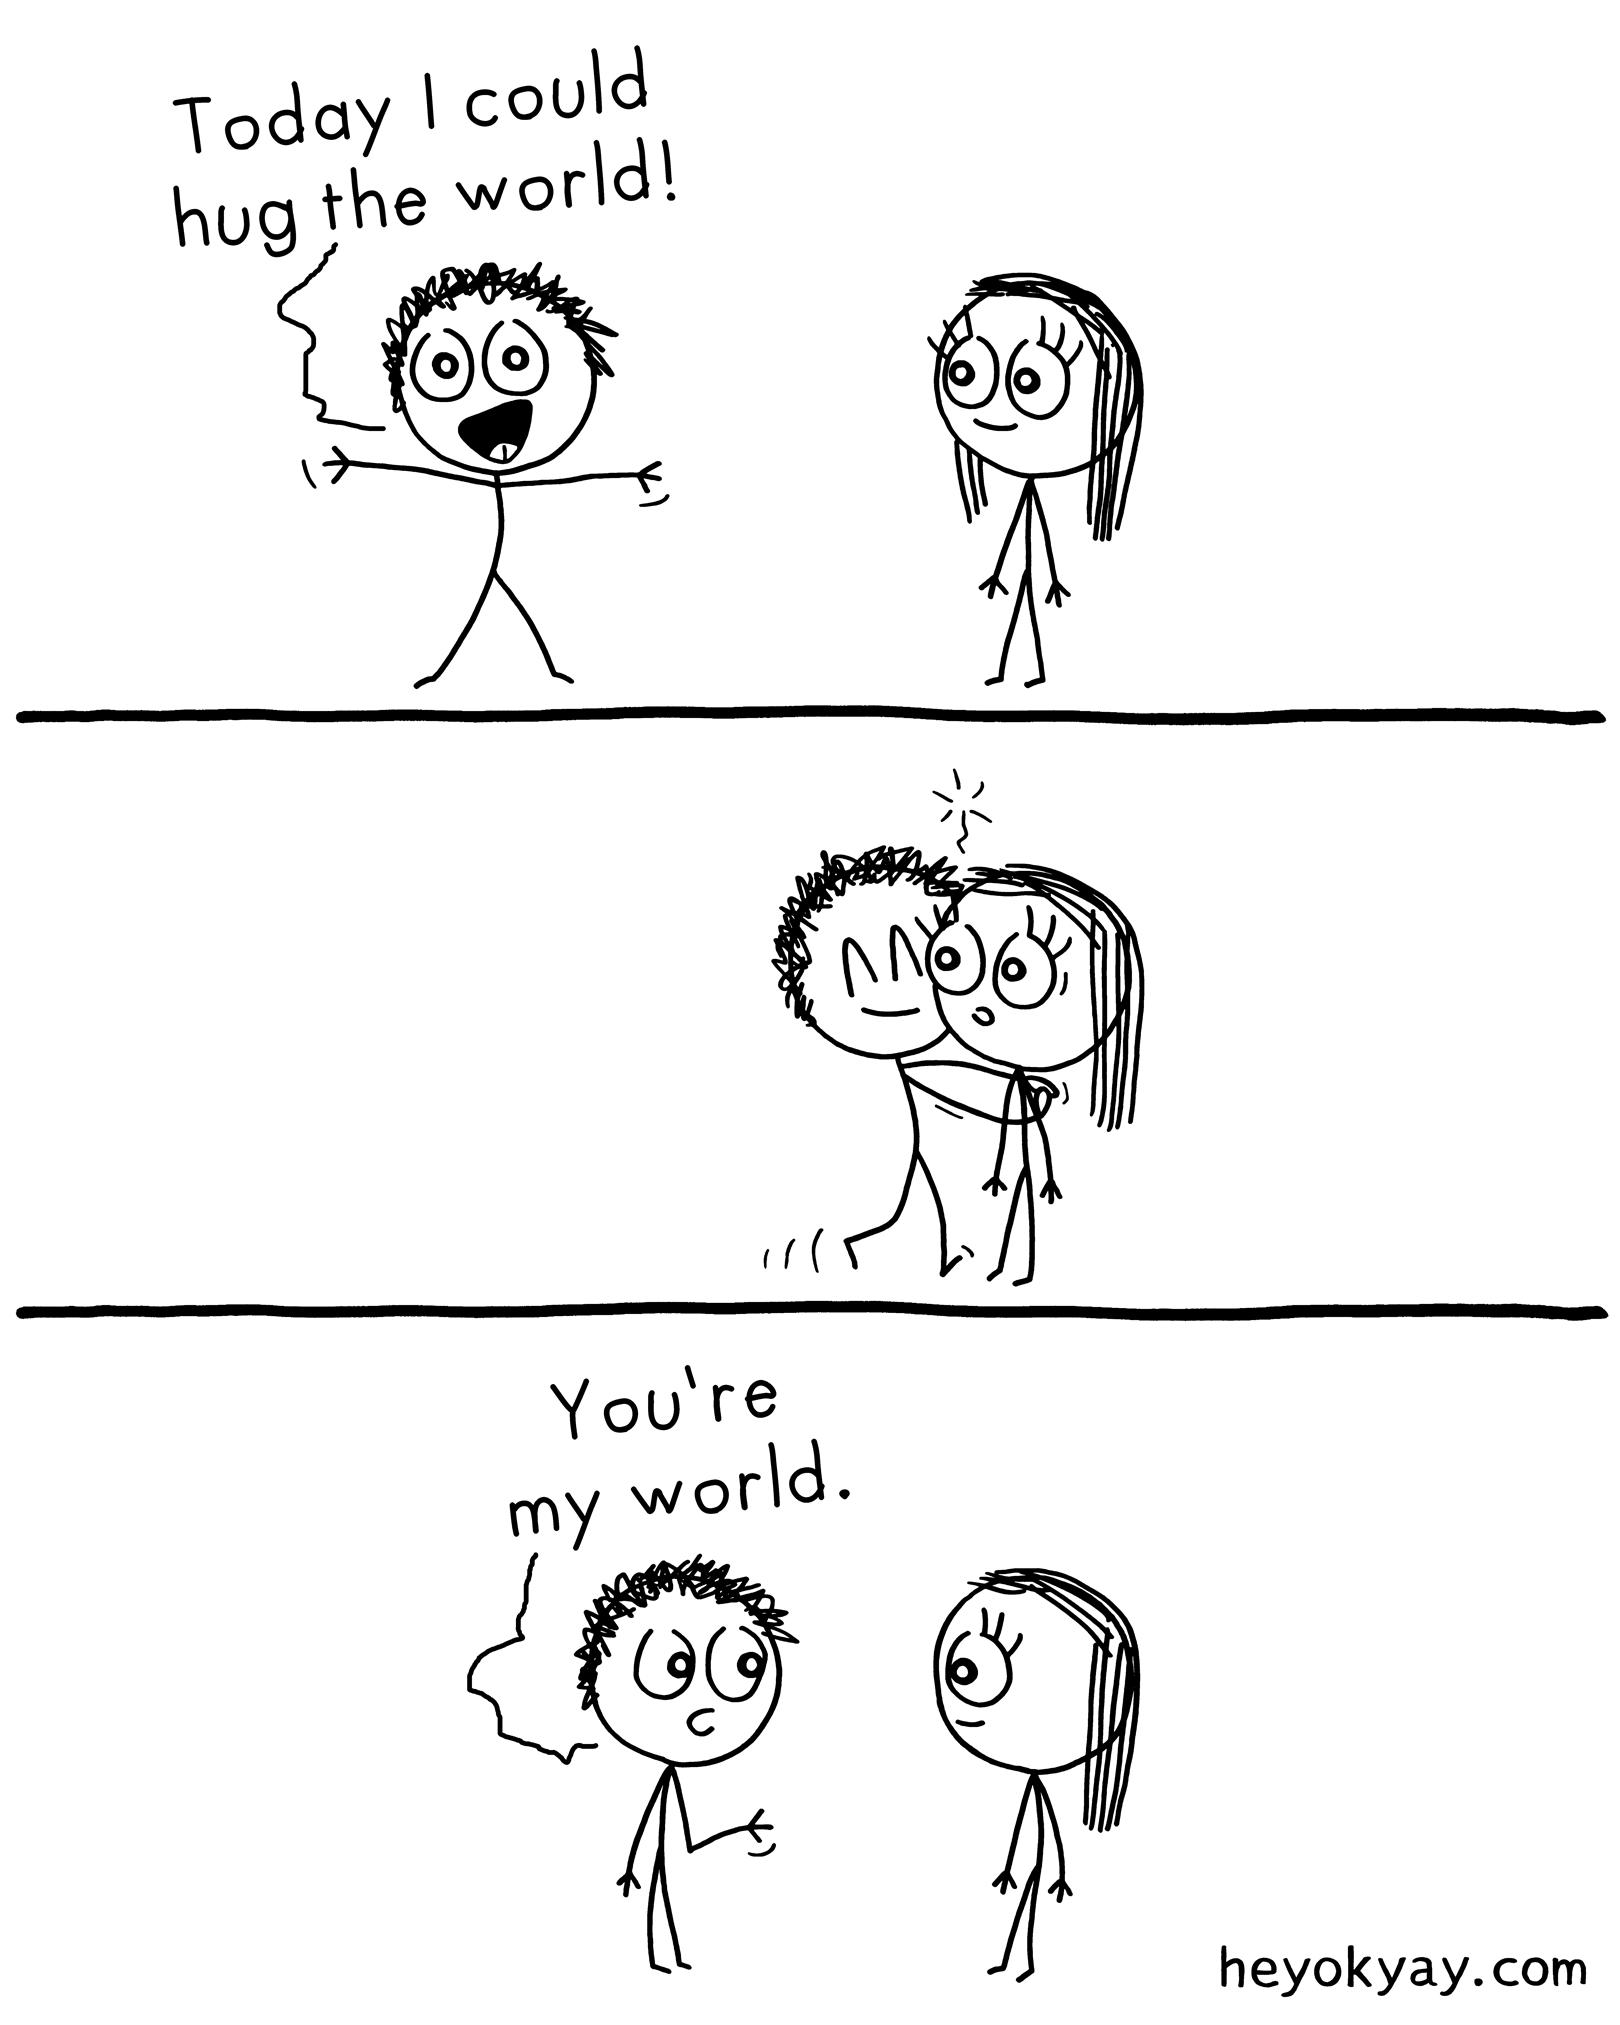 #love #comics #hugging #cute #heyokyay